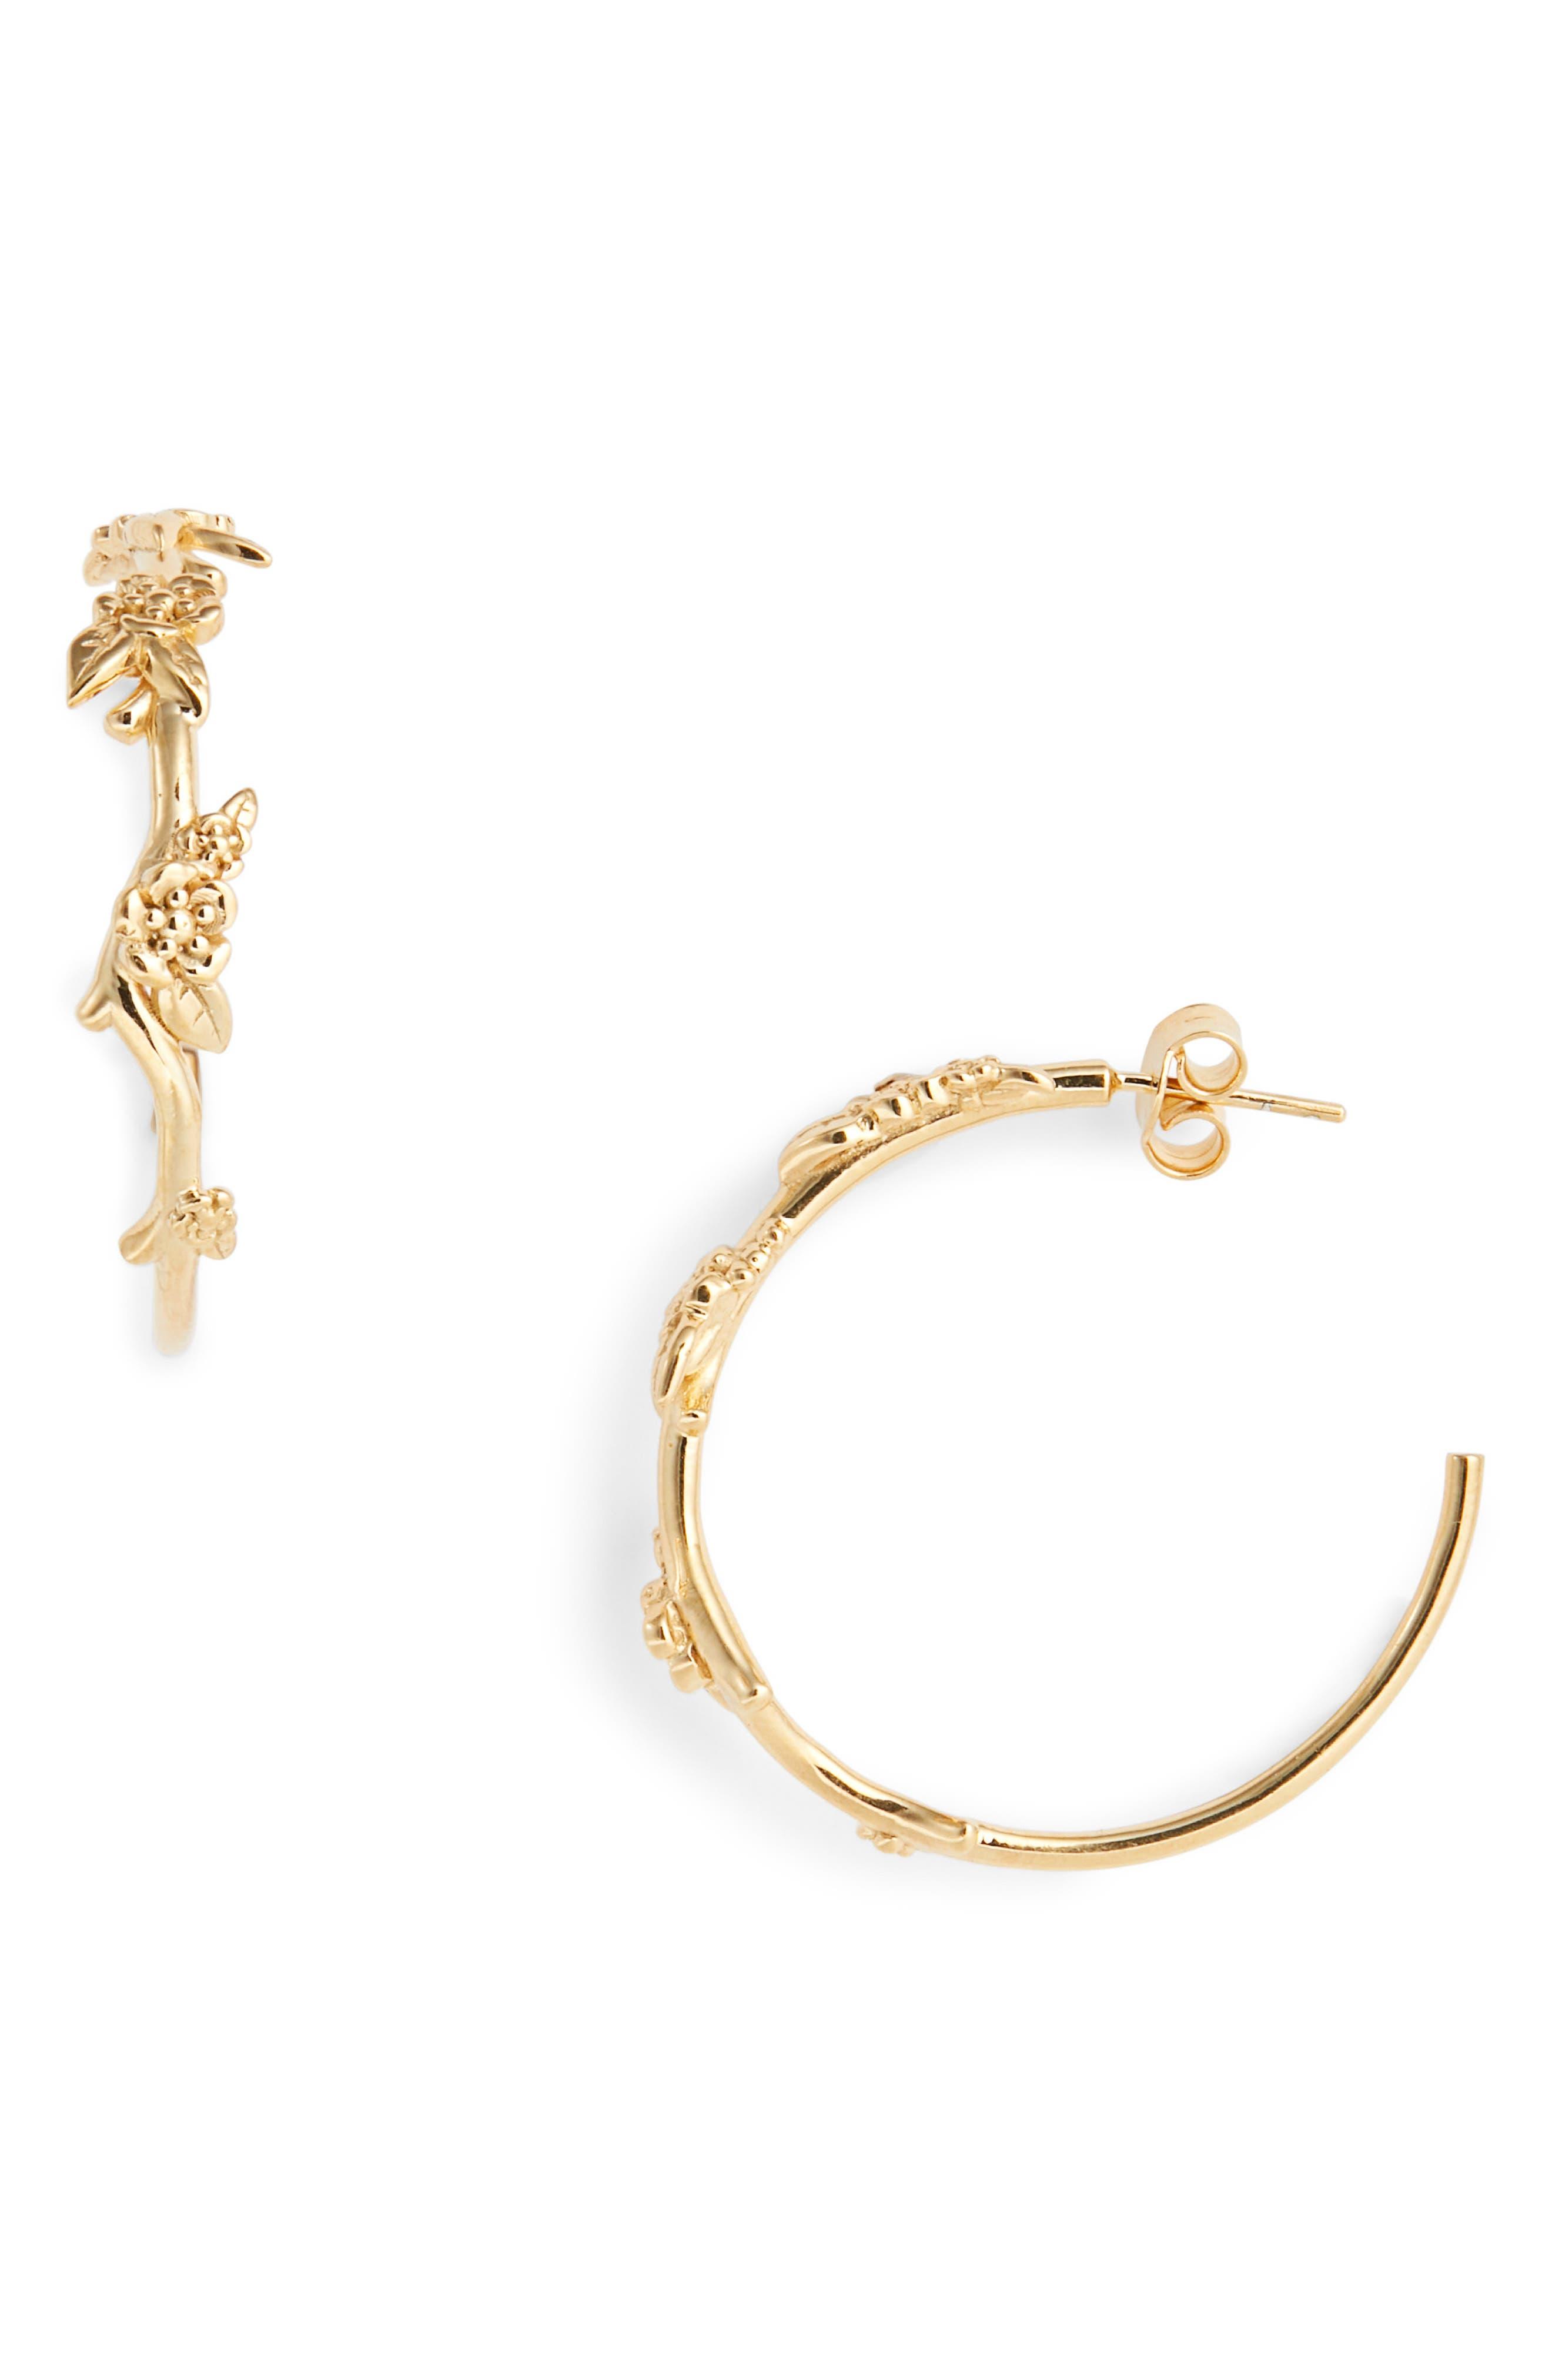 Large Alba Hoop Earrings,                             Main thumbnail 1, color,                             GOLD PLATED